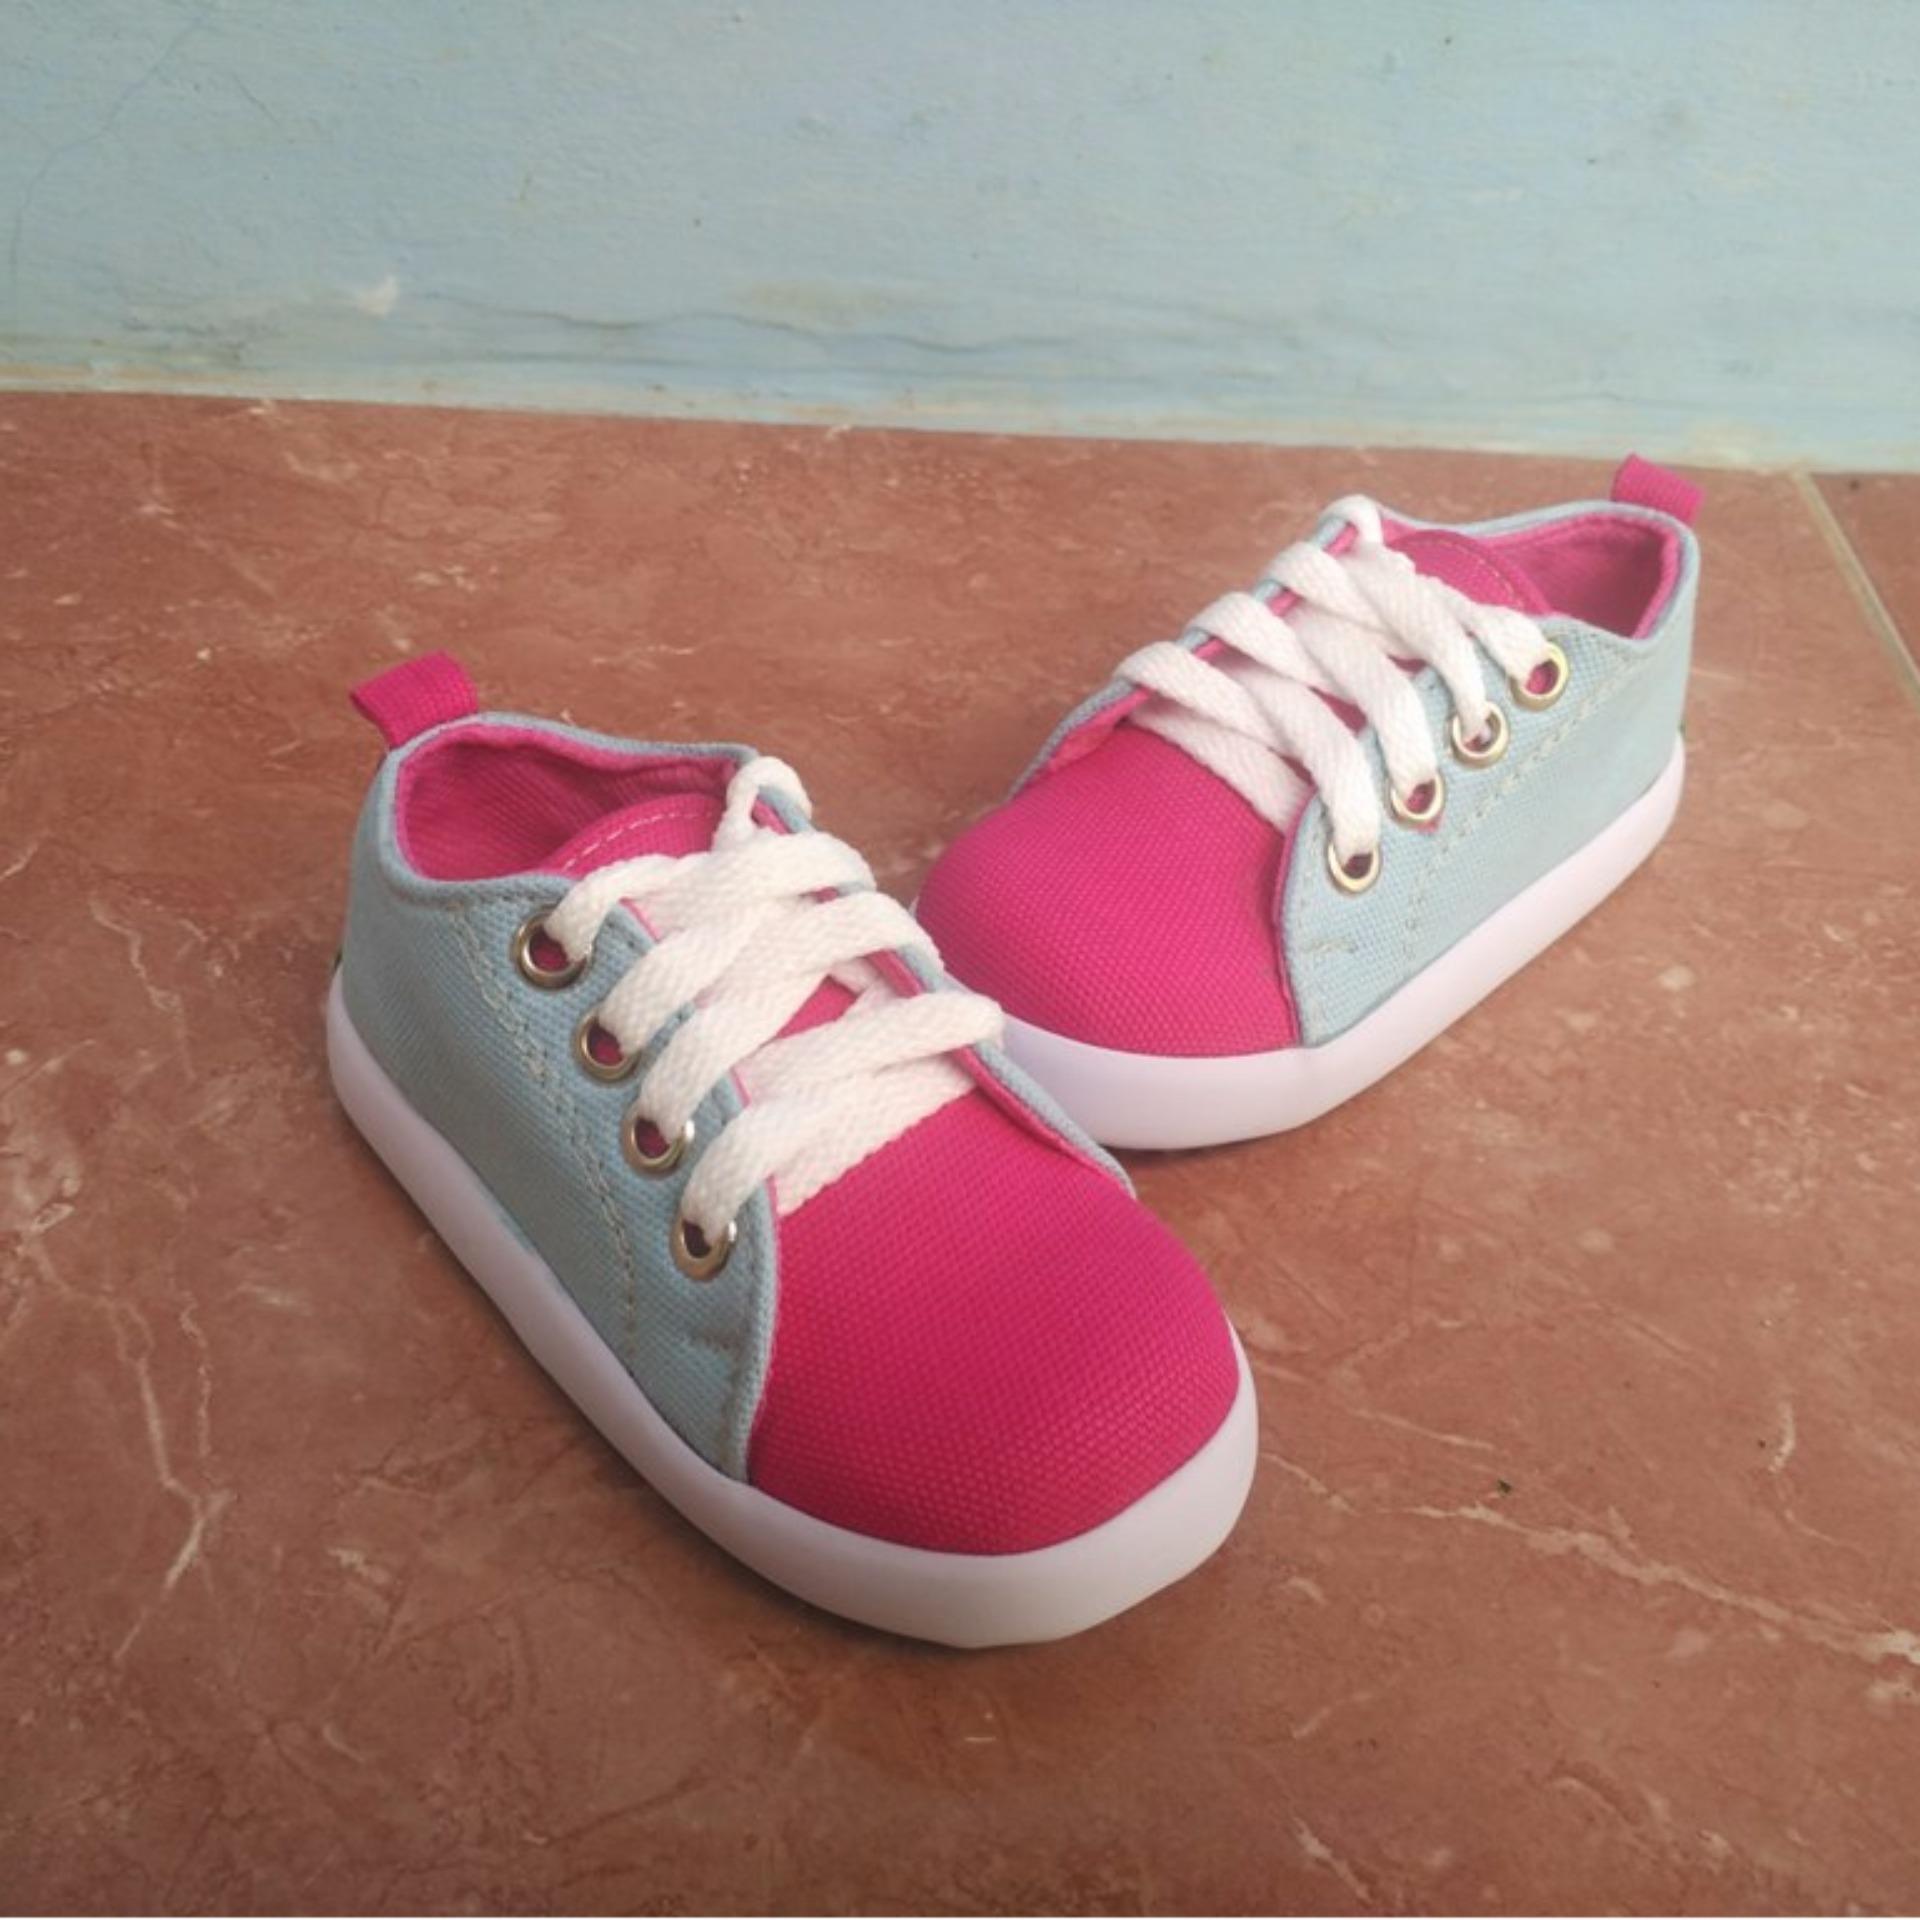 Harga Sepatu Sneaker Anak Perempuan Biru Pink Lucu By Shuku Terbaru